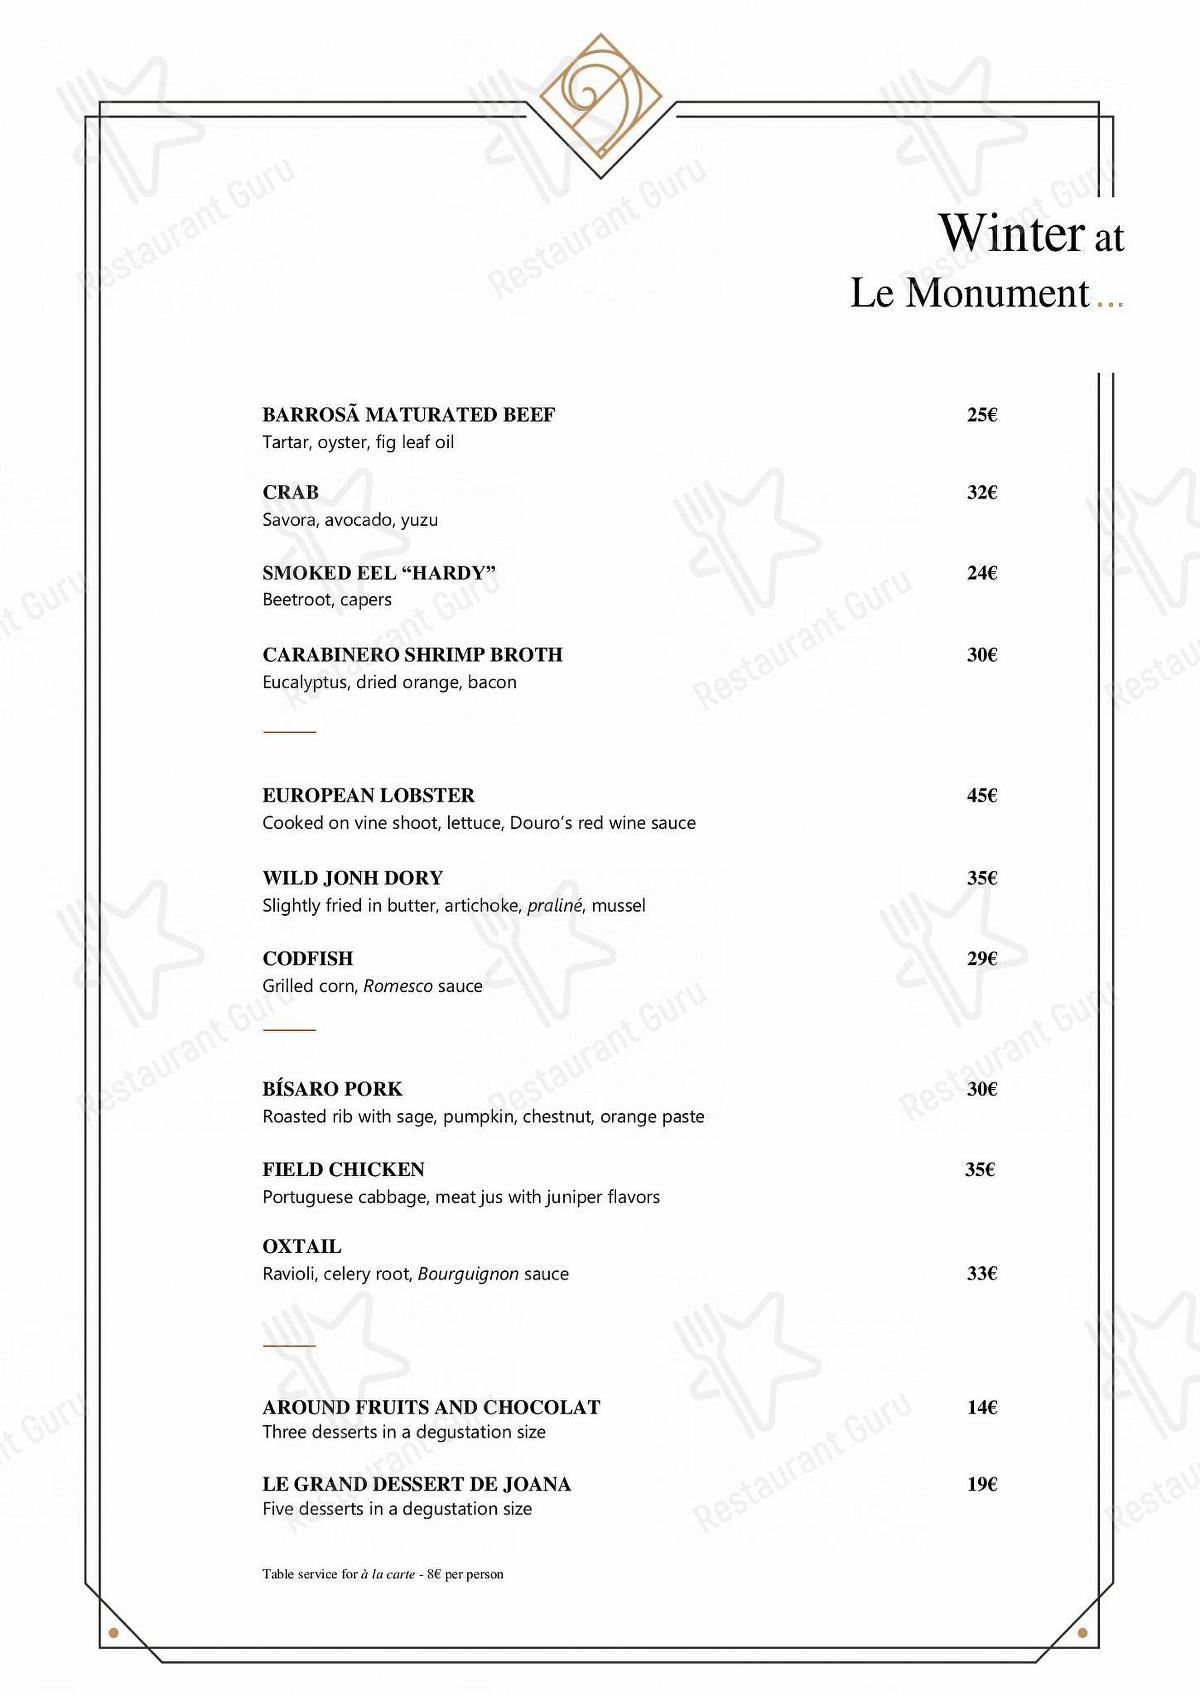 Menu para Le Monument restaurante